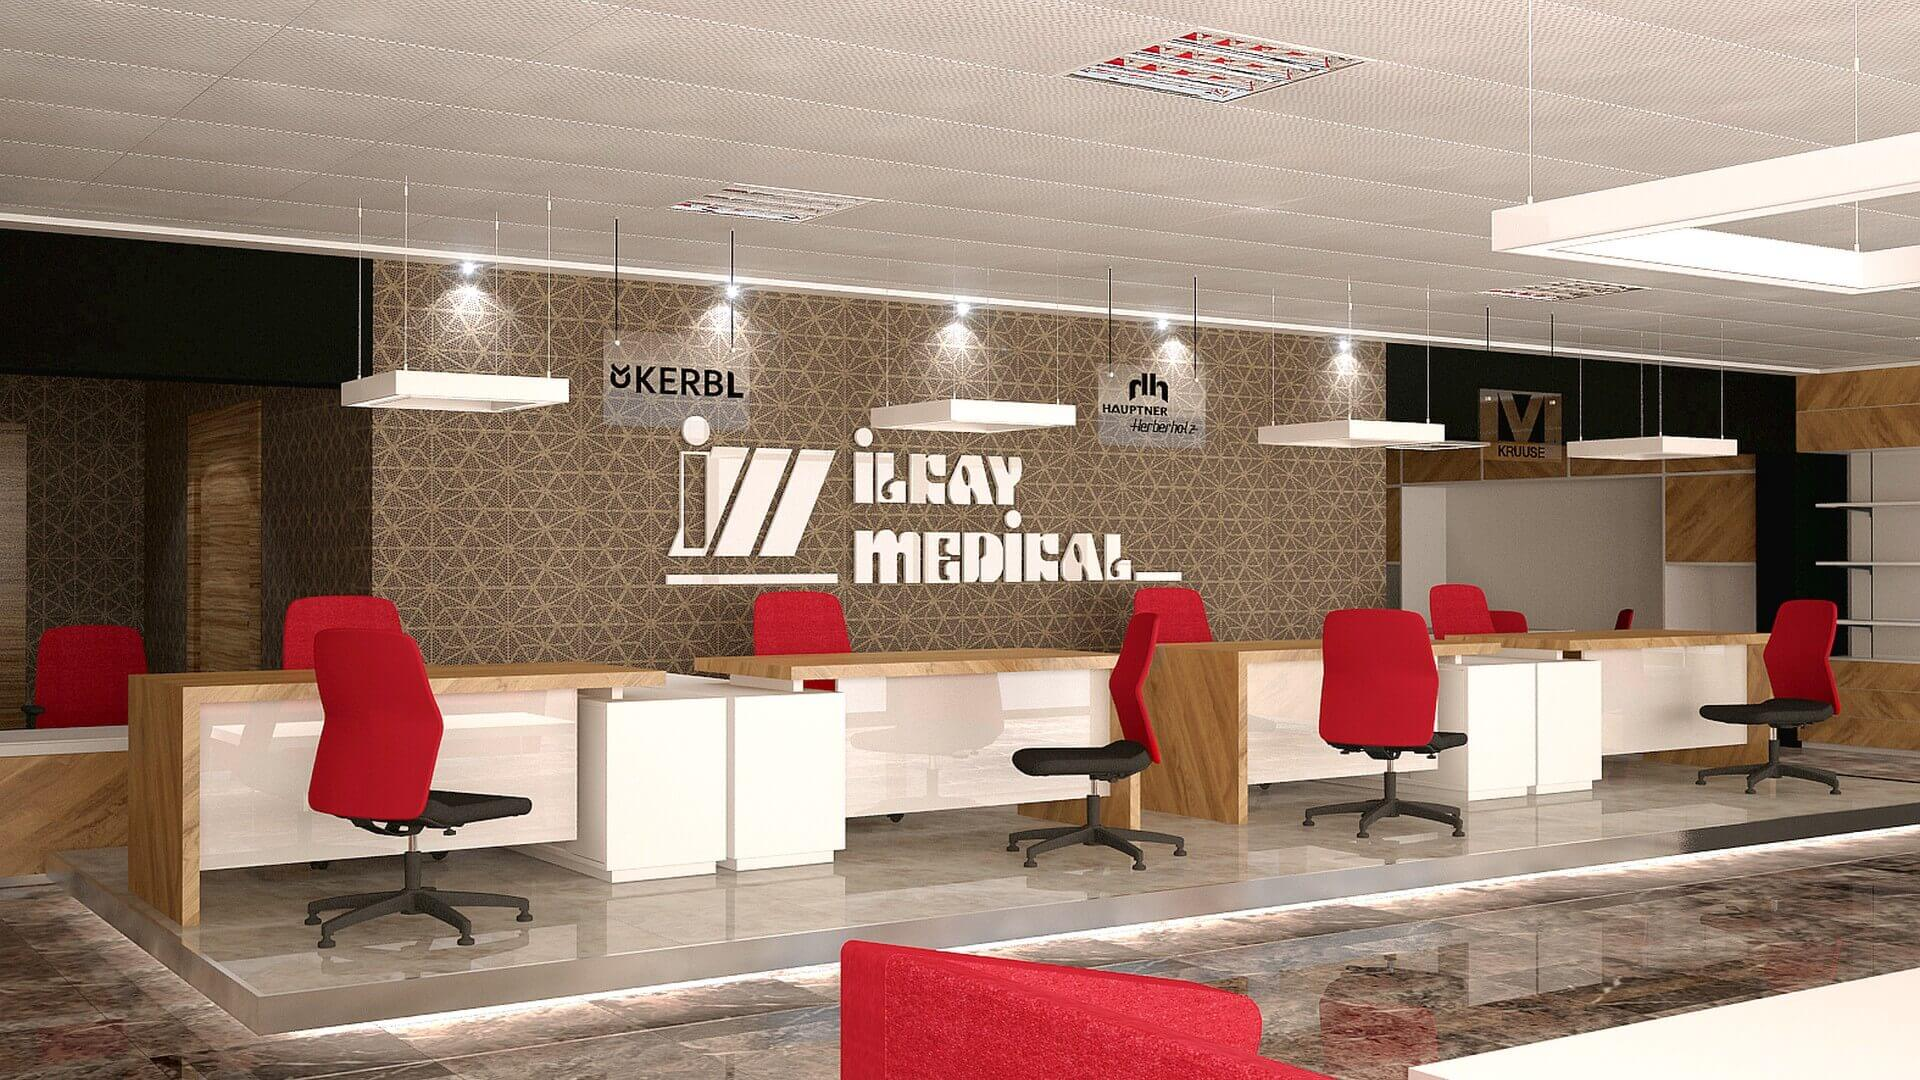 shop design 2022 Ilkay Medical Shop Retail